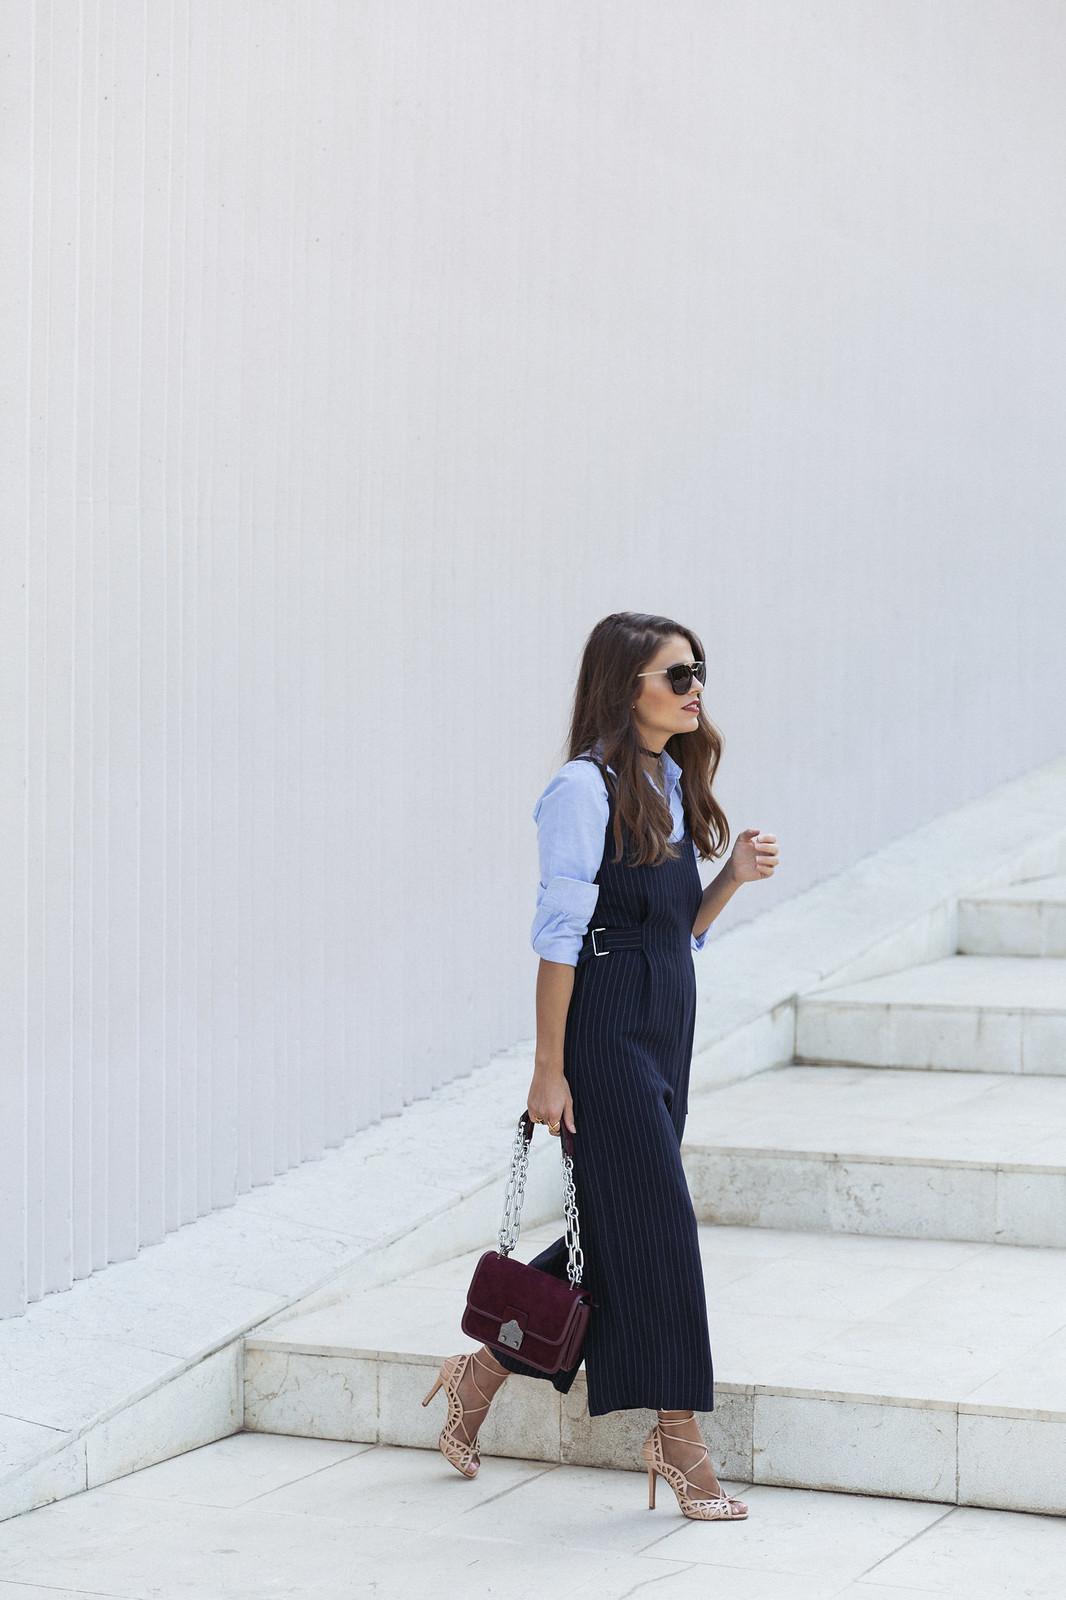 Jessie Chanes Seams for a desire - Pinstripped suit topshop heeled sandals schutz parfois bag  -1